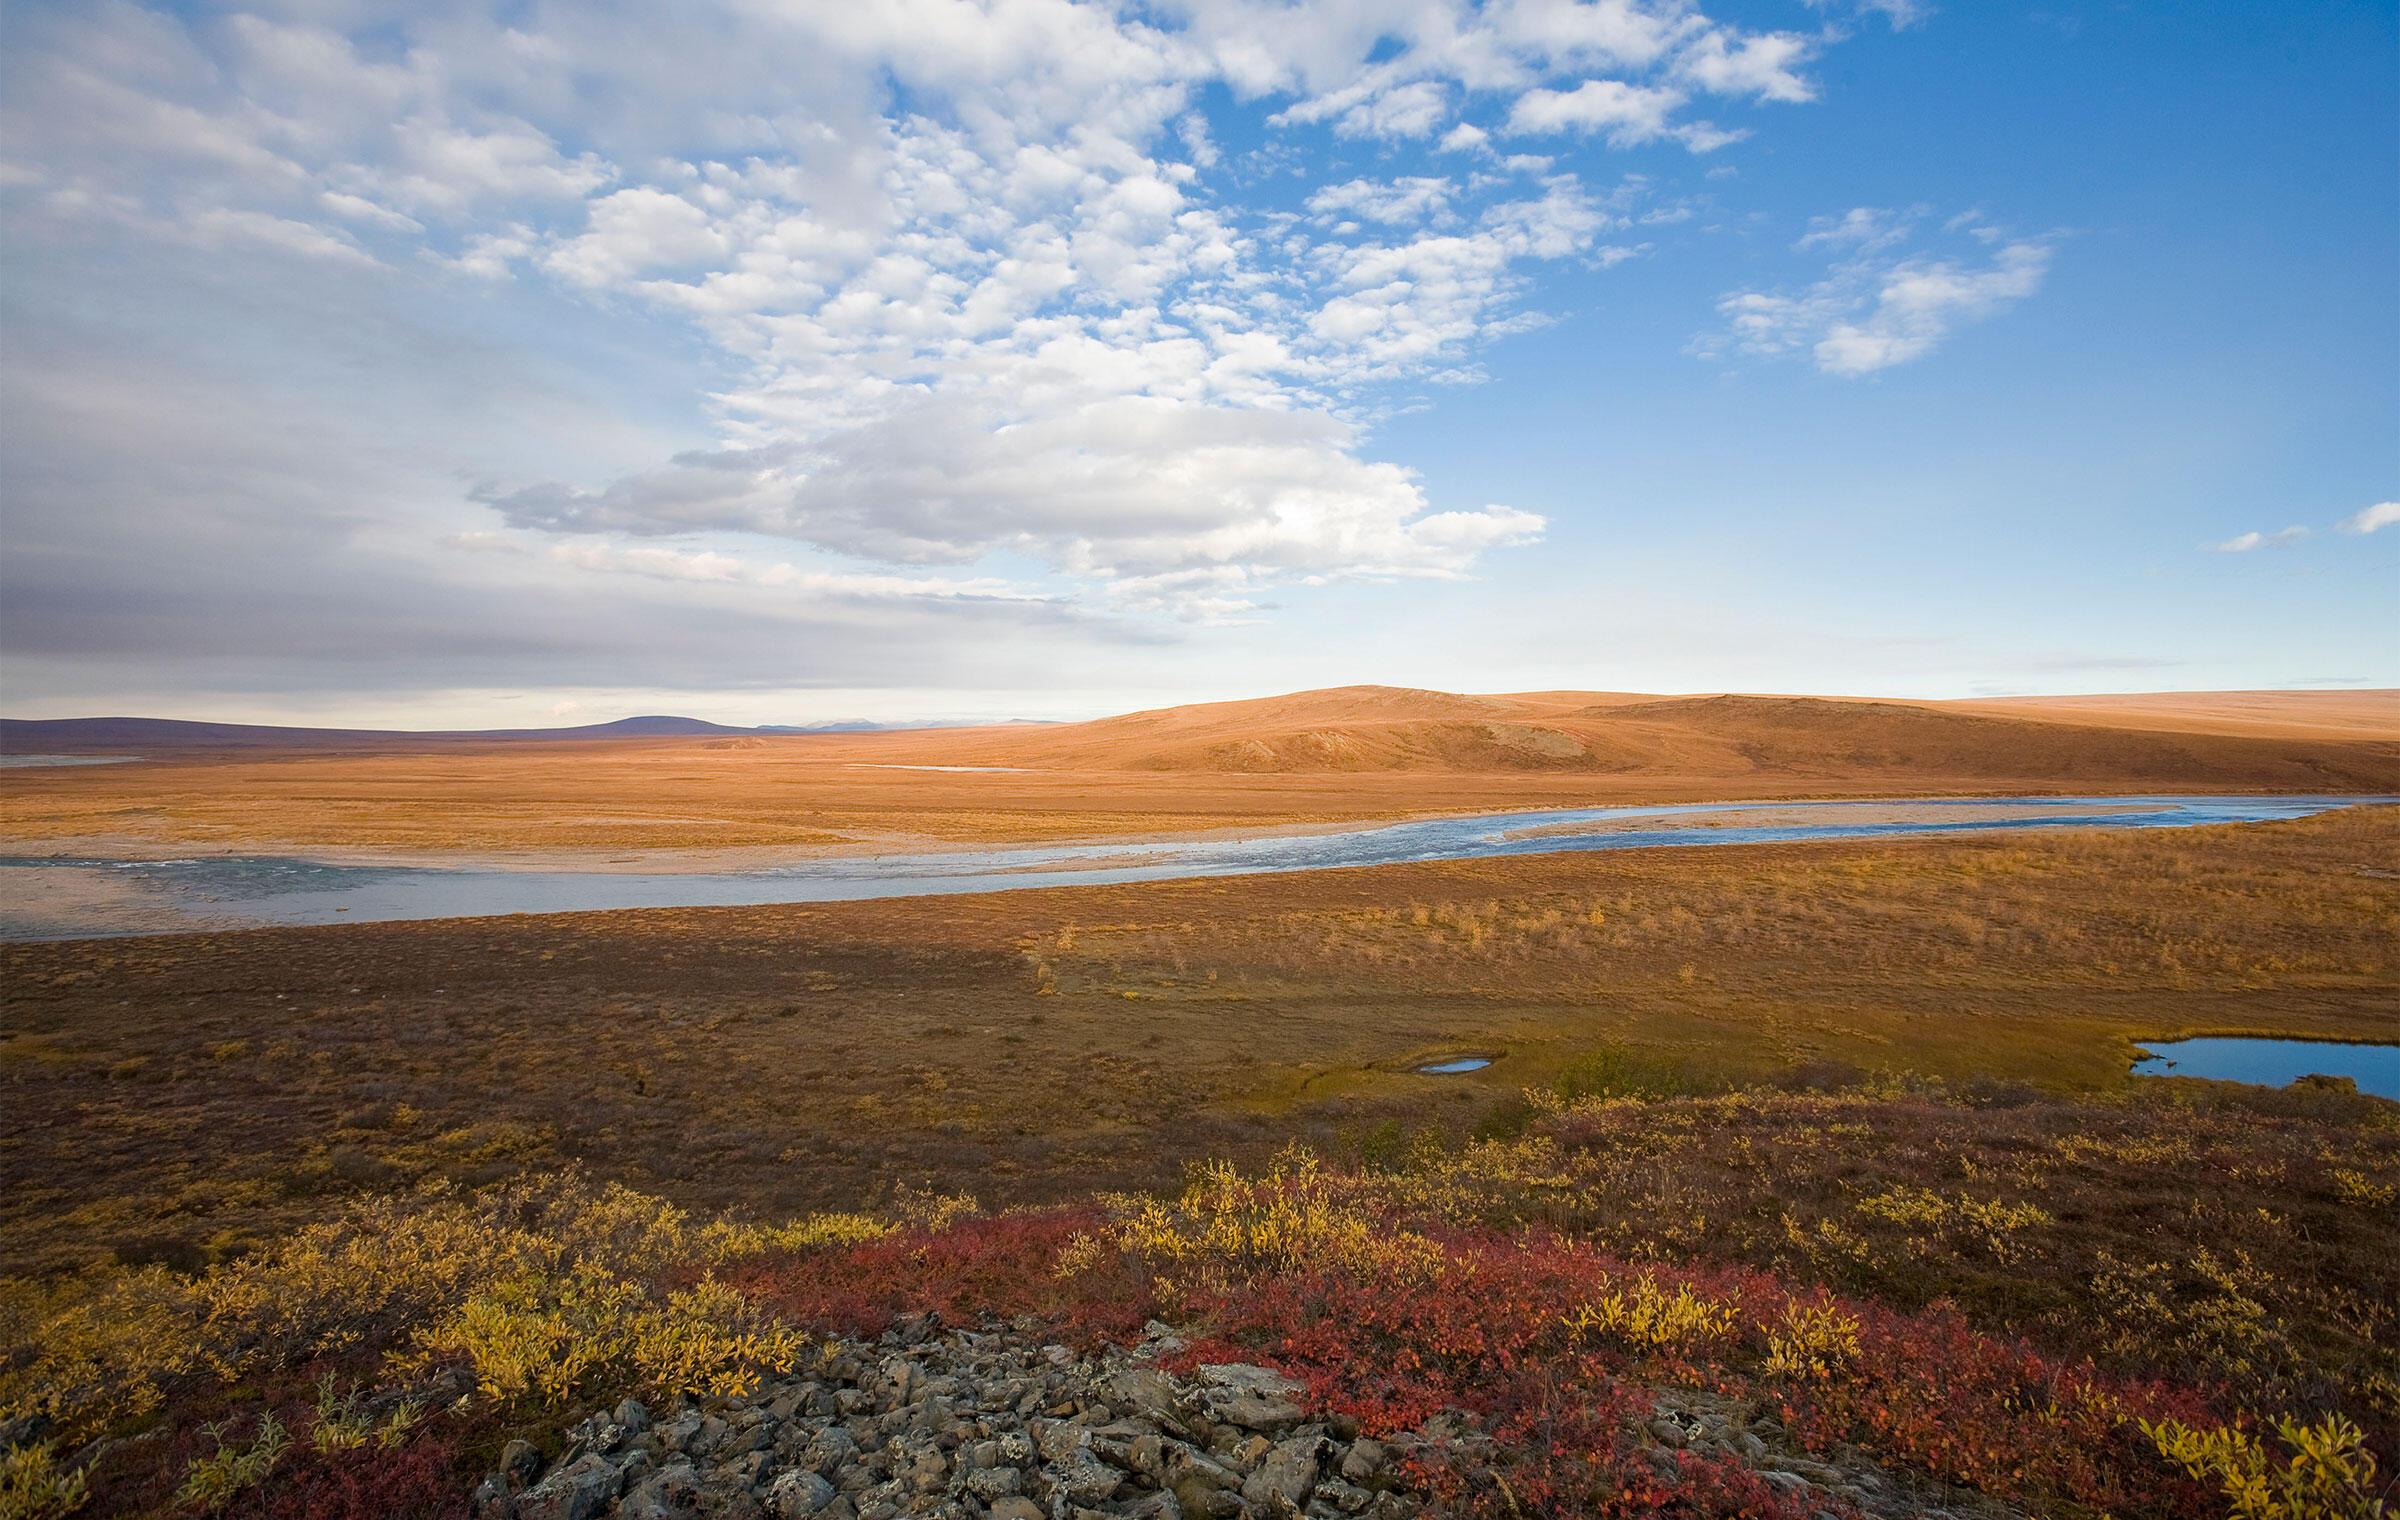 Coastal plain in the Arctic National Wildlife Refuge during autumn. Accent Alaska/Alamy